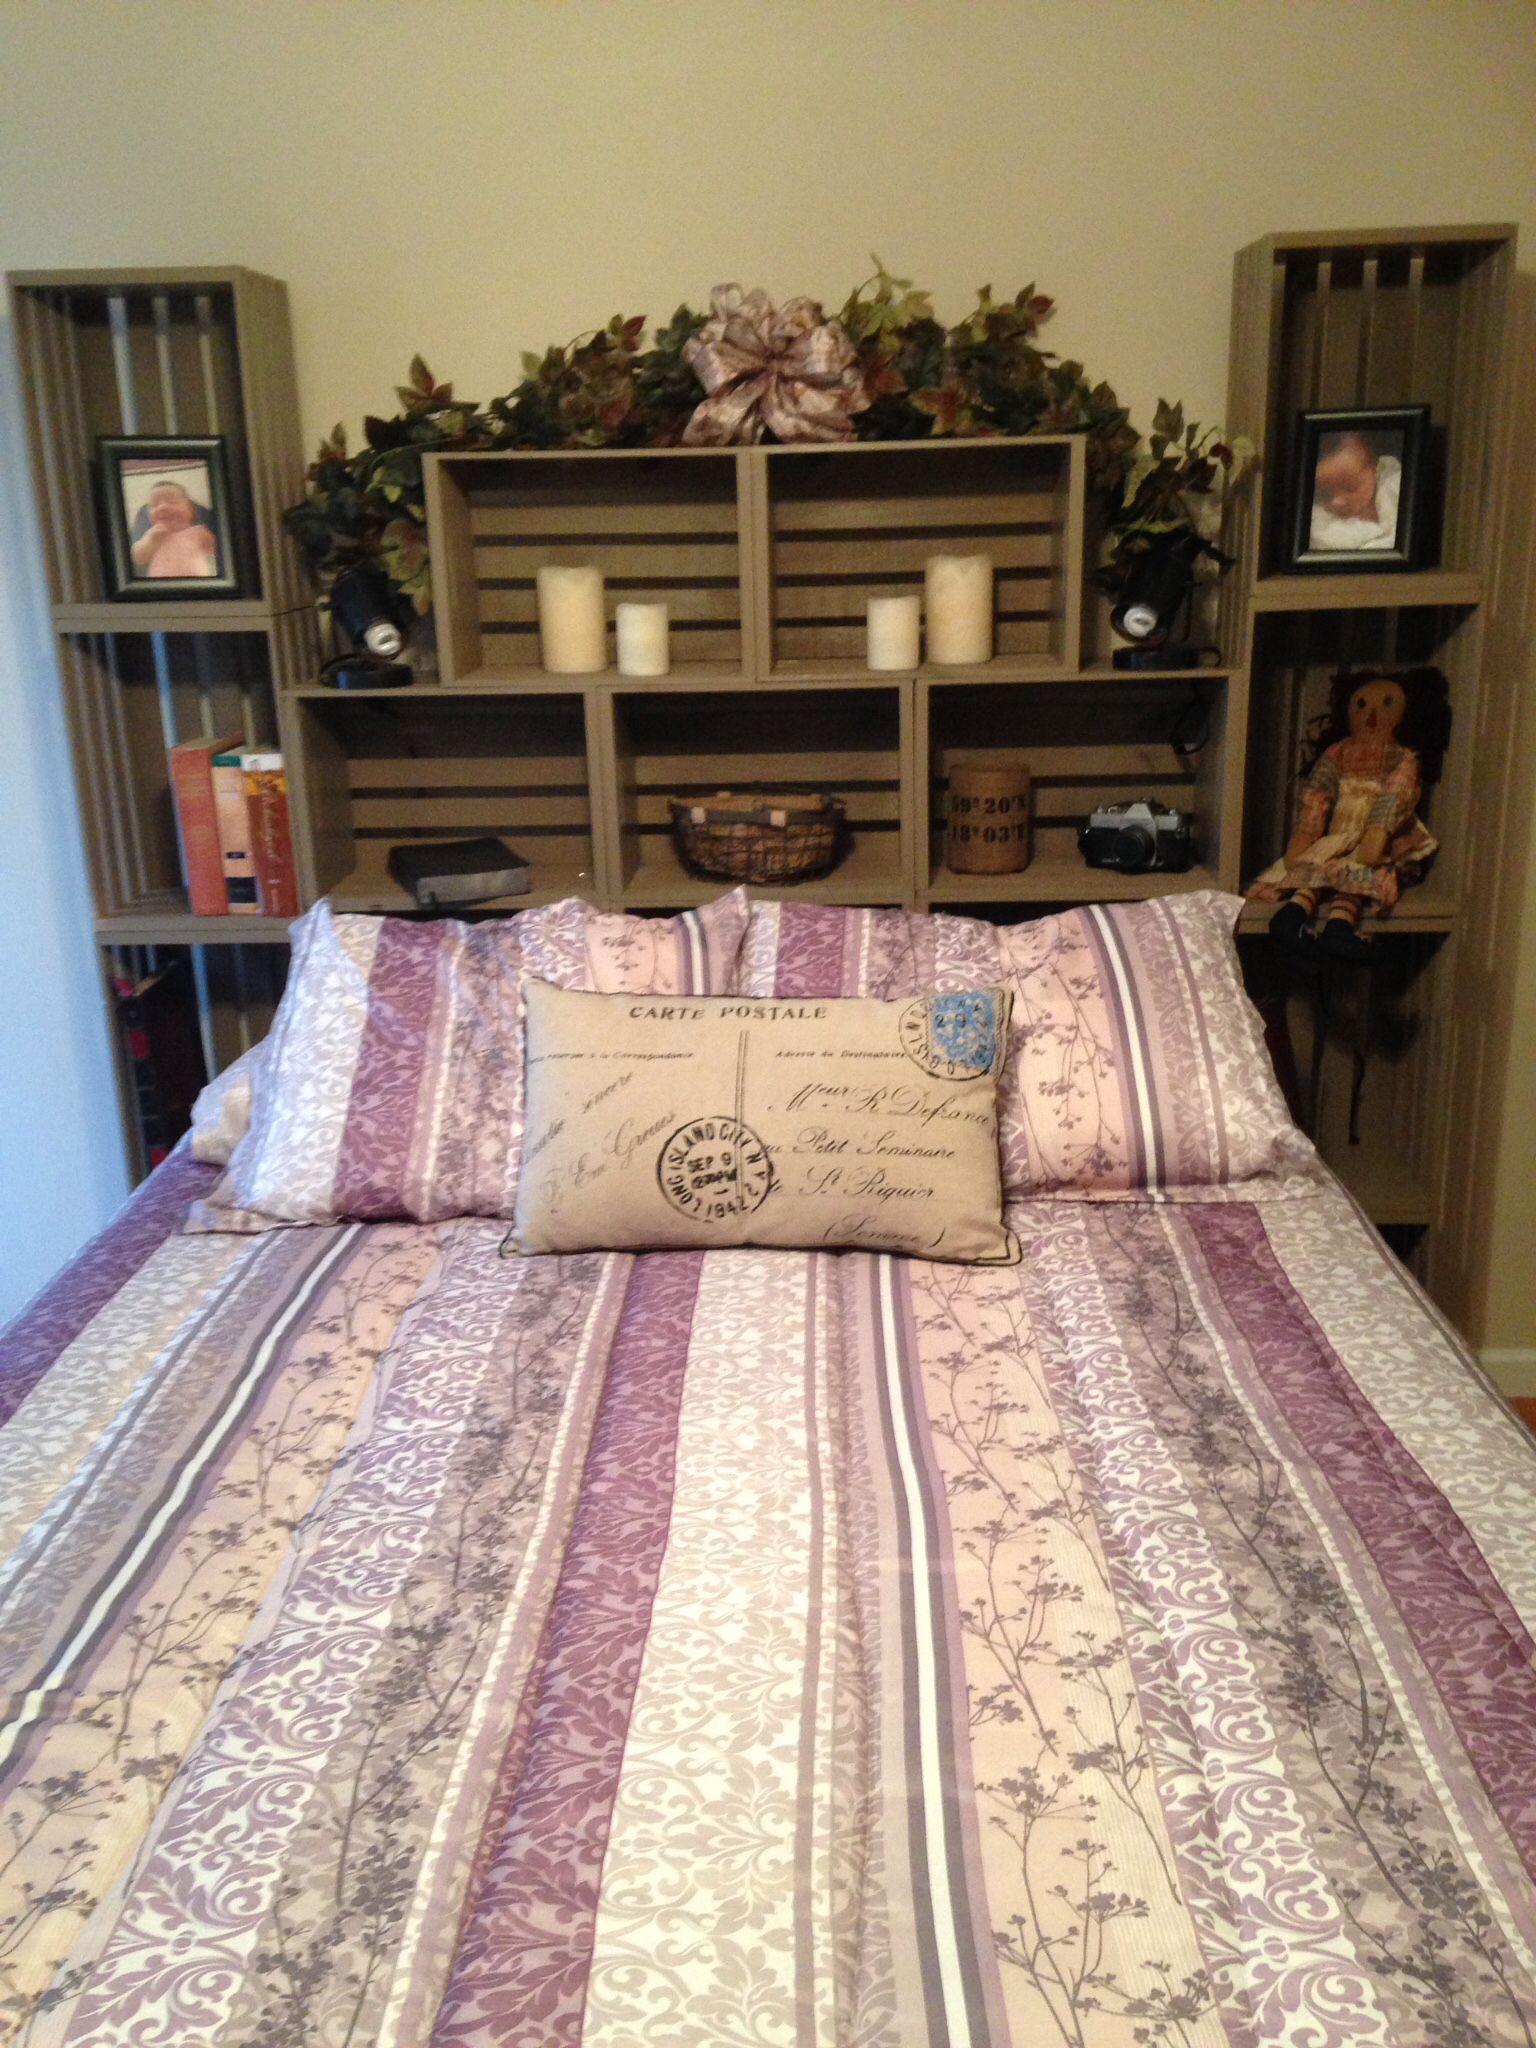 Queen Crate Headboard Bookshelf Headboard Pallet Furniture